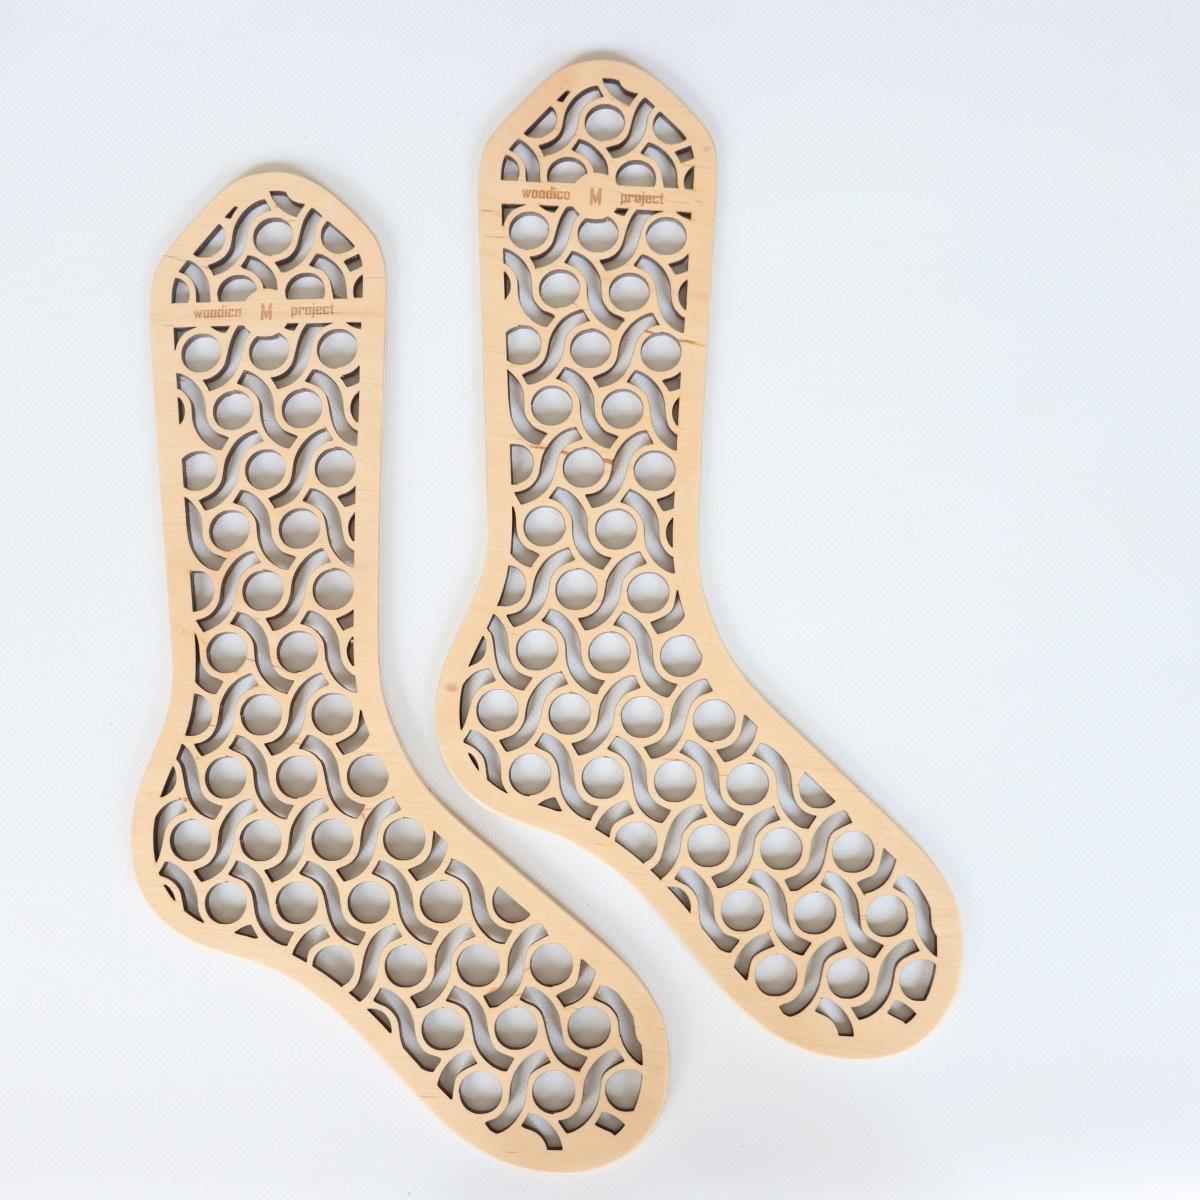 woodico.pro wooden sock blockers pasta 1 1200x1200 - Wooden sock blockers / Pasta